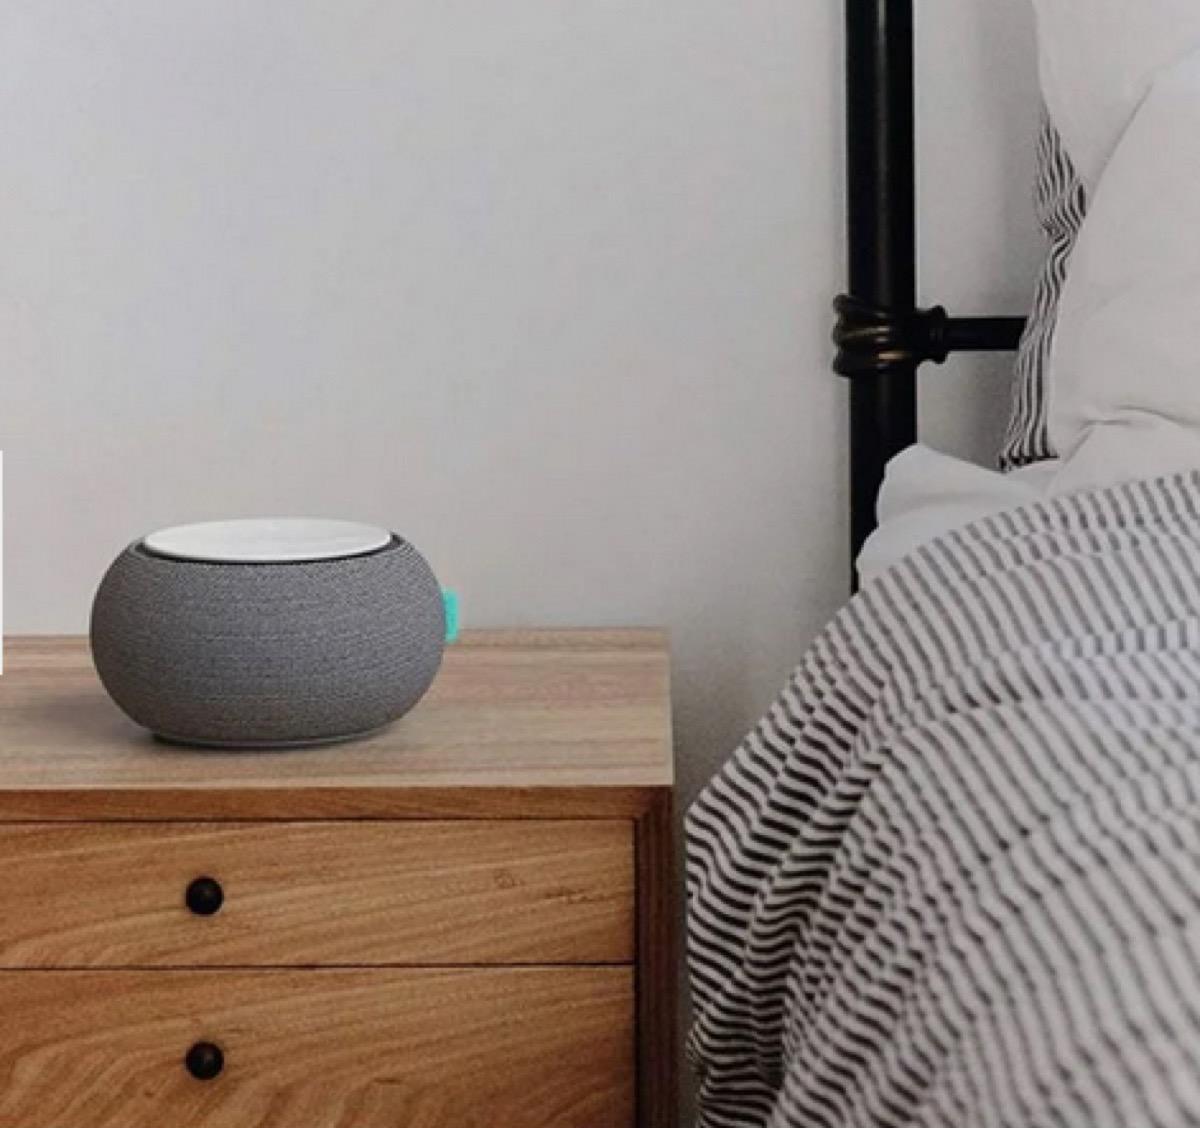 gray white noise machine on wooden nightstand next to bed with seersucker comforter